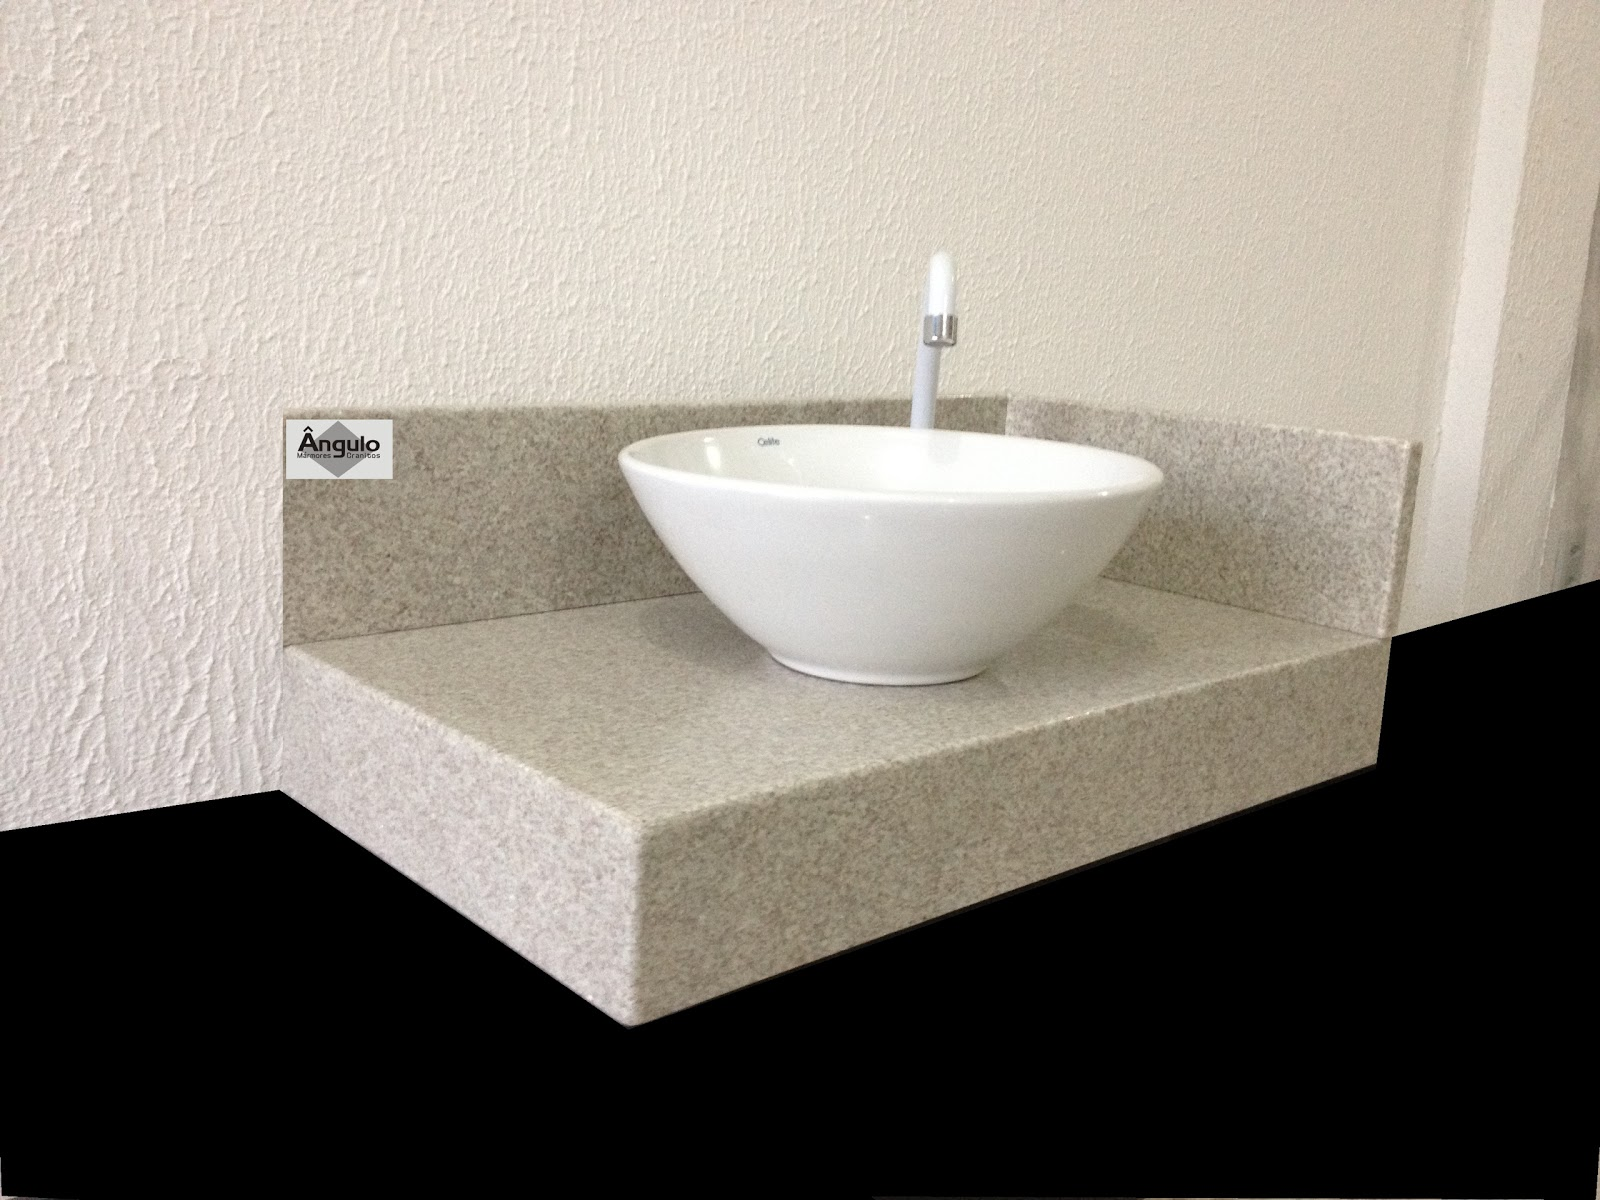 Mármores e Granitos: Bancada de Banheiro Granito Branco Siena #000000 1600x1200 Bancada De Banheiro Em Granito